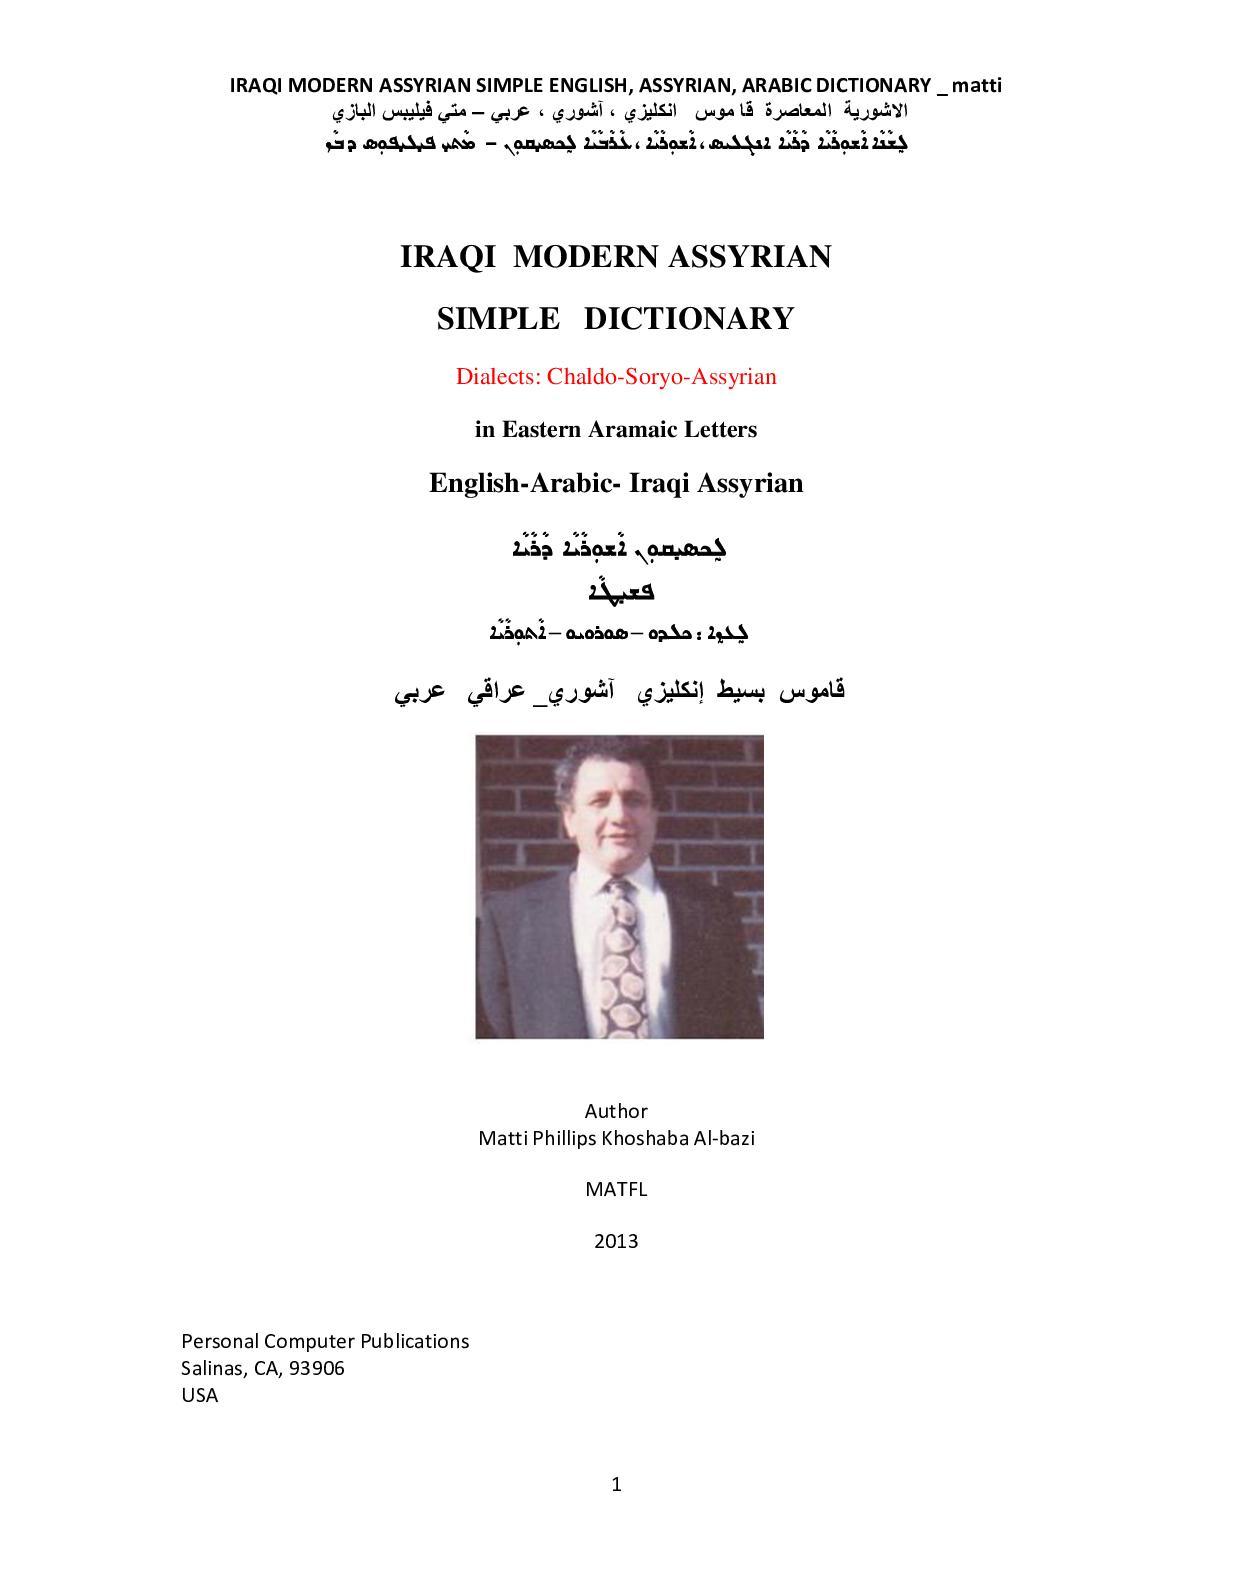 ae99f45e1749a Calaméo - القاموس العراقي البسيط للإنكليزية واللغة الاشورية المعاصرة  والعربية